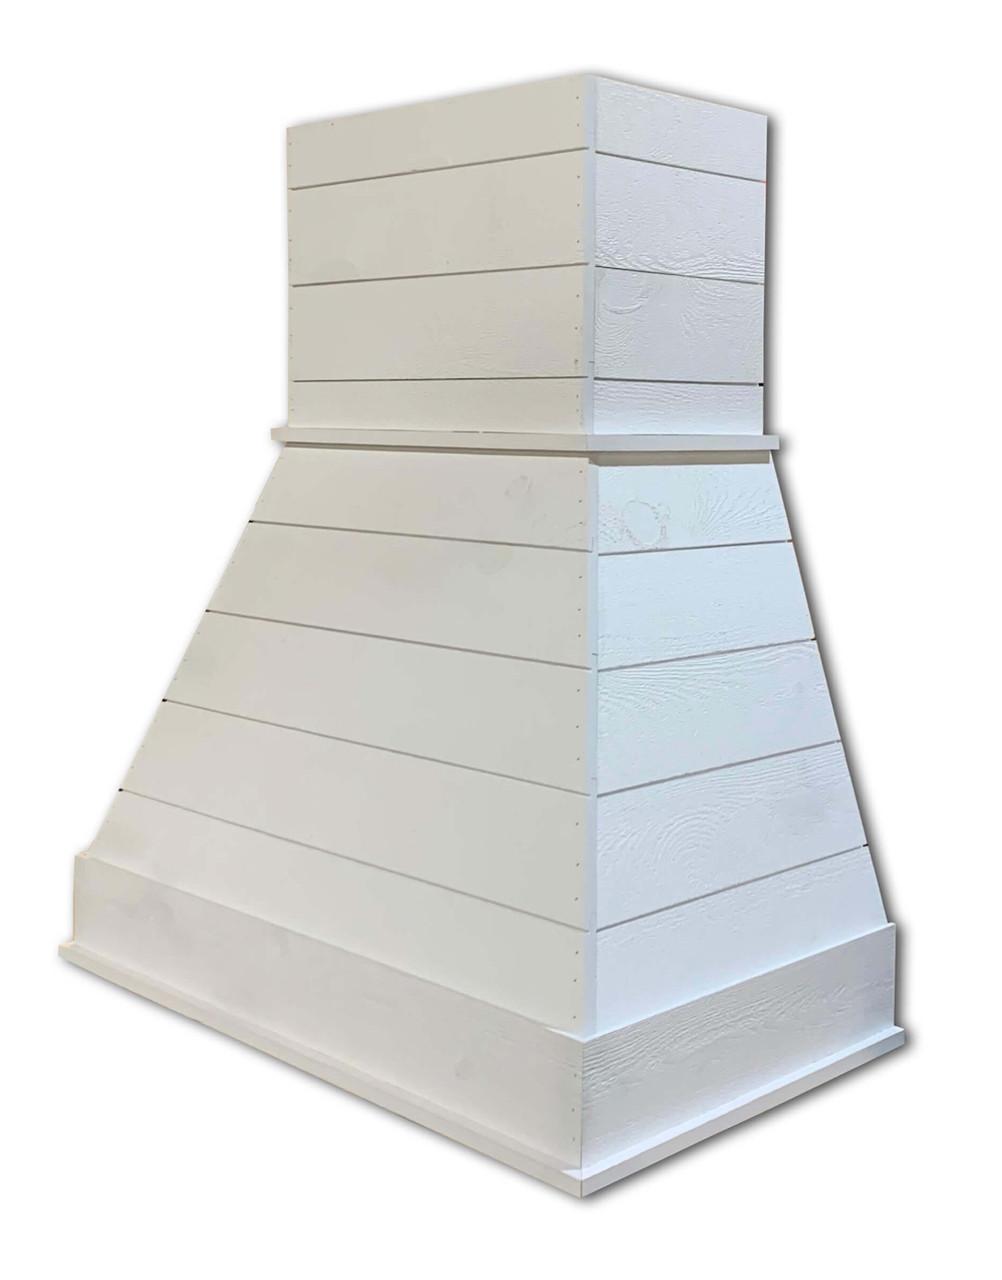 "Castlewood 48"" Rustic Shiplap Chimney Range Hood, White SY-WCSLR-48-WH"